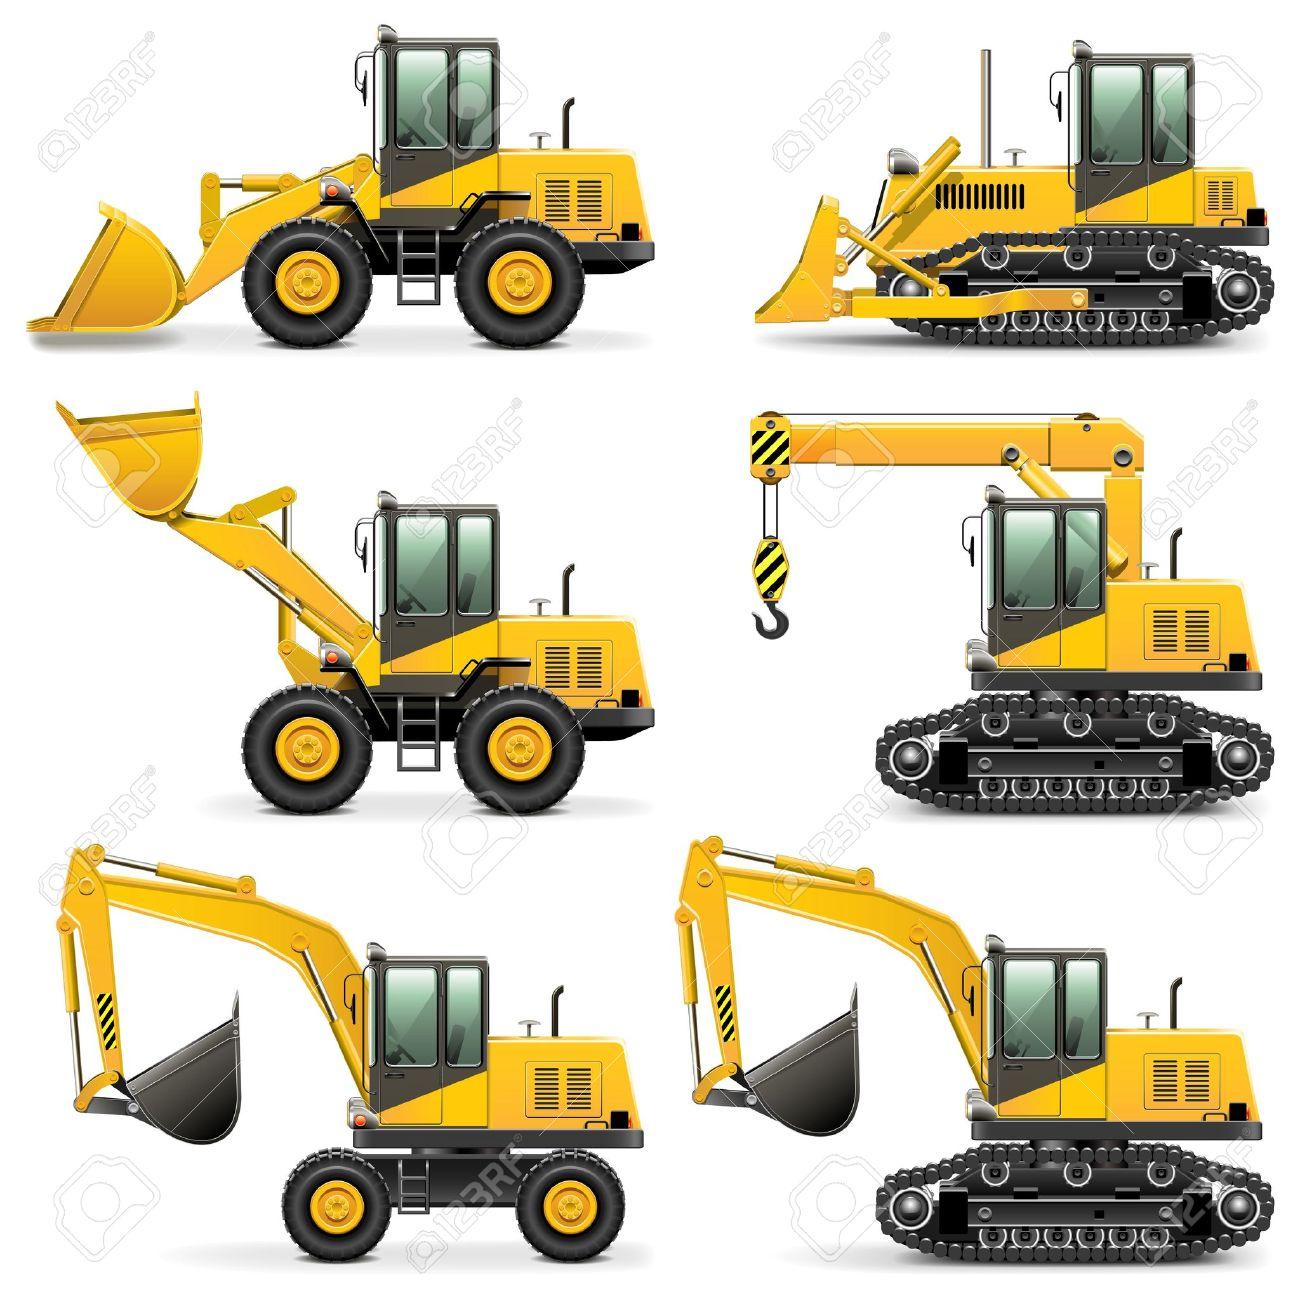 Vector Construction Machines Set 3 Stock Vector - 21869717